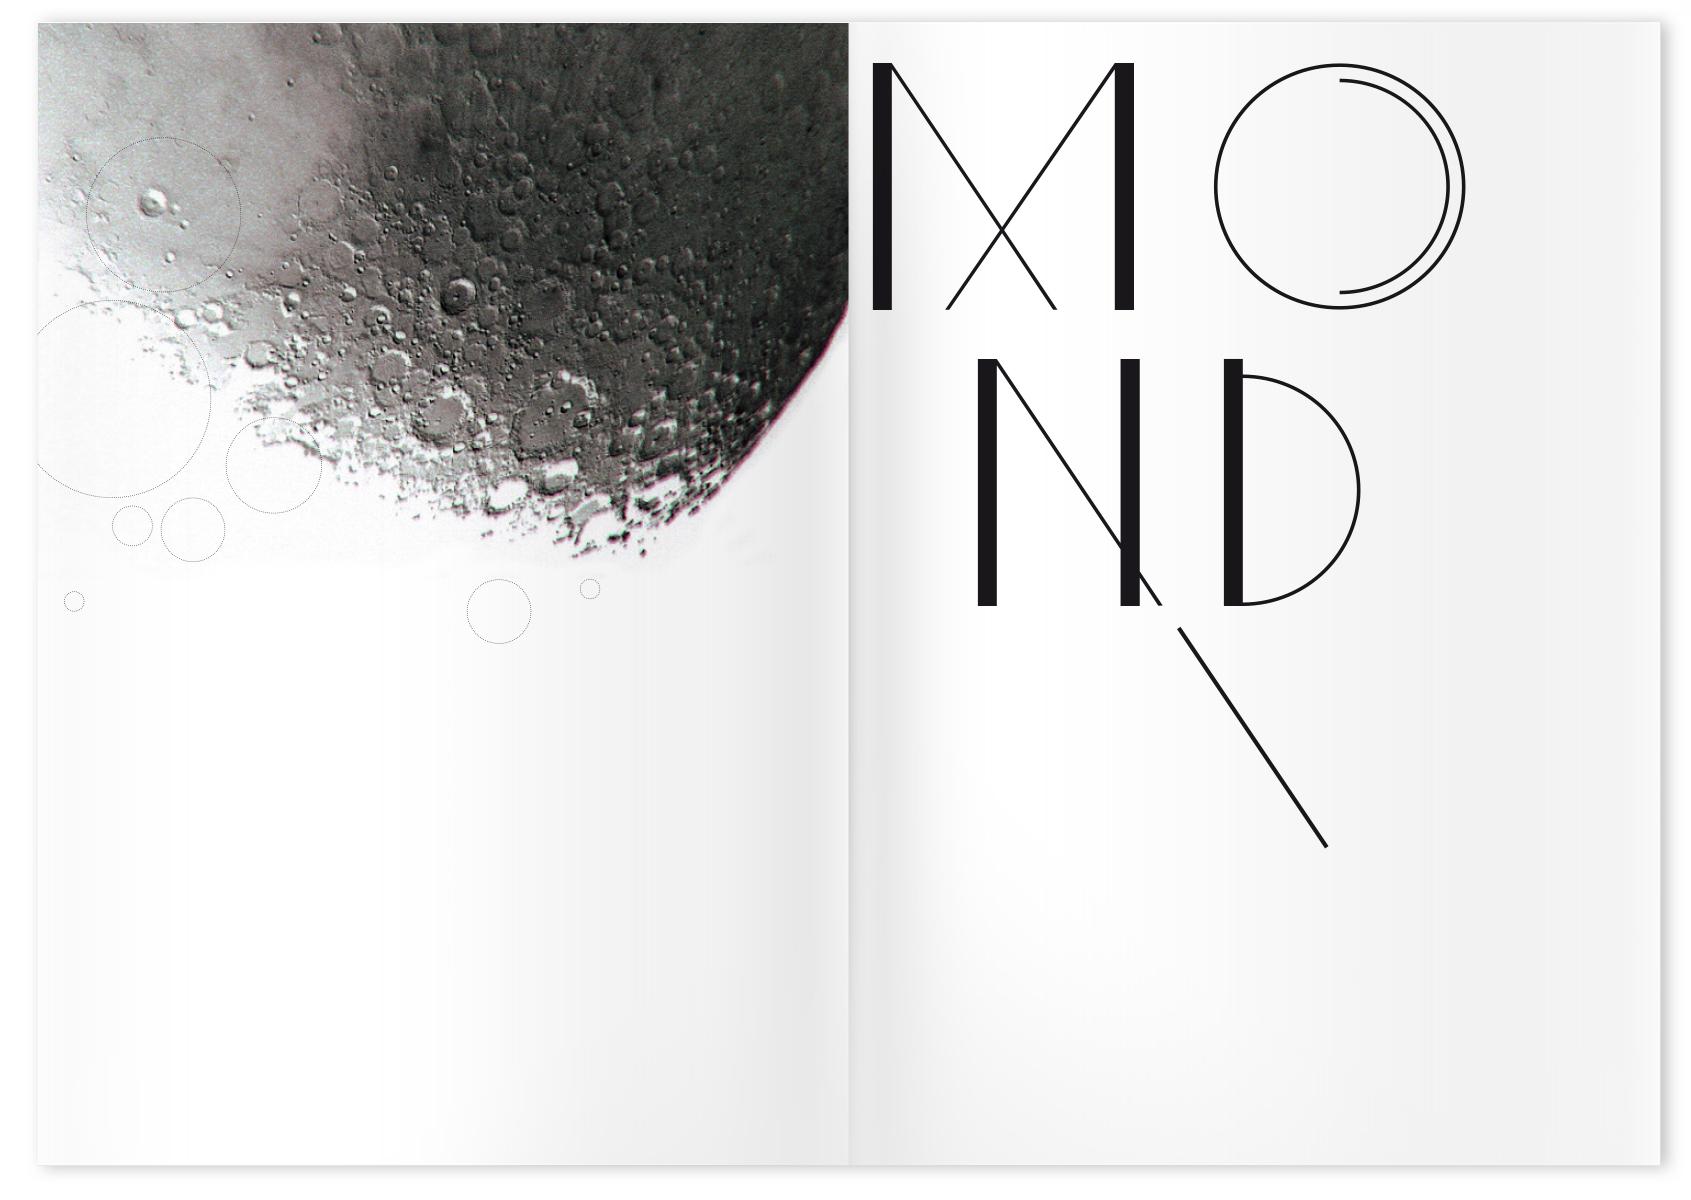 04_Cosmos-Magazin_hsrm-Hochschule-RheinMain_Editorial-Design_Grafikdesign_Gloria-Kison.jpg